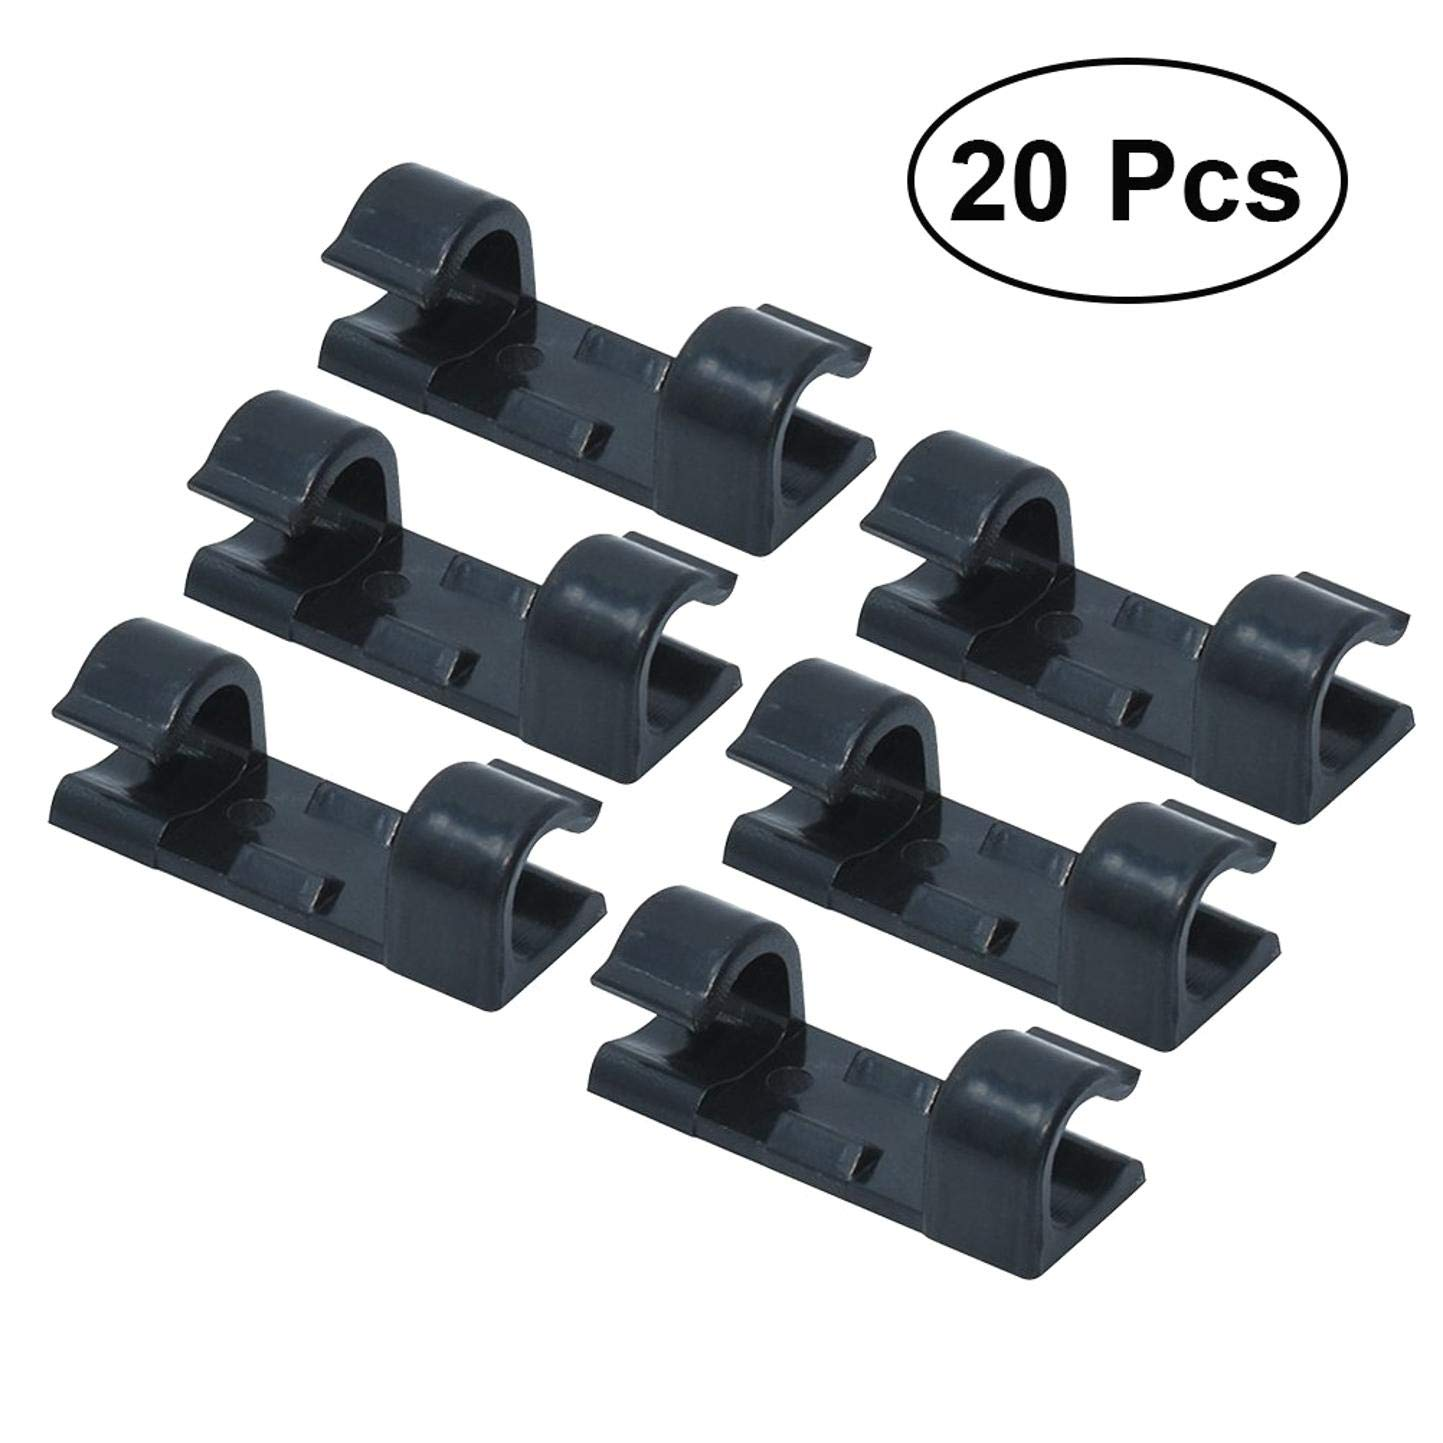 Soporte de Cable de pl/ástico ZAK168 40 Clips de Cable autoadhesivos para Coche Show Clips fijos Cable de Datos SUV 40pcs GPS